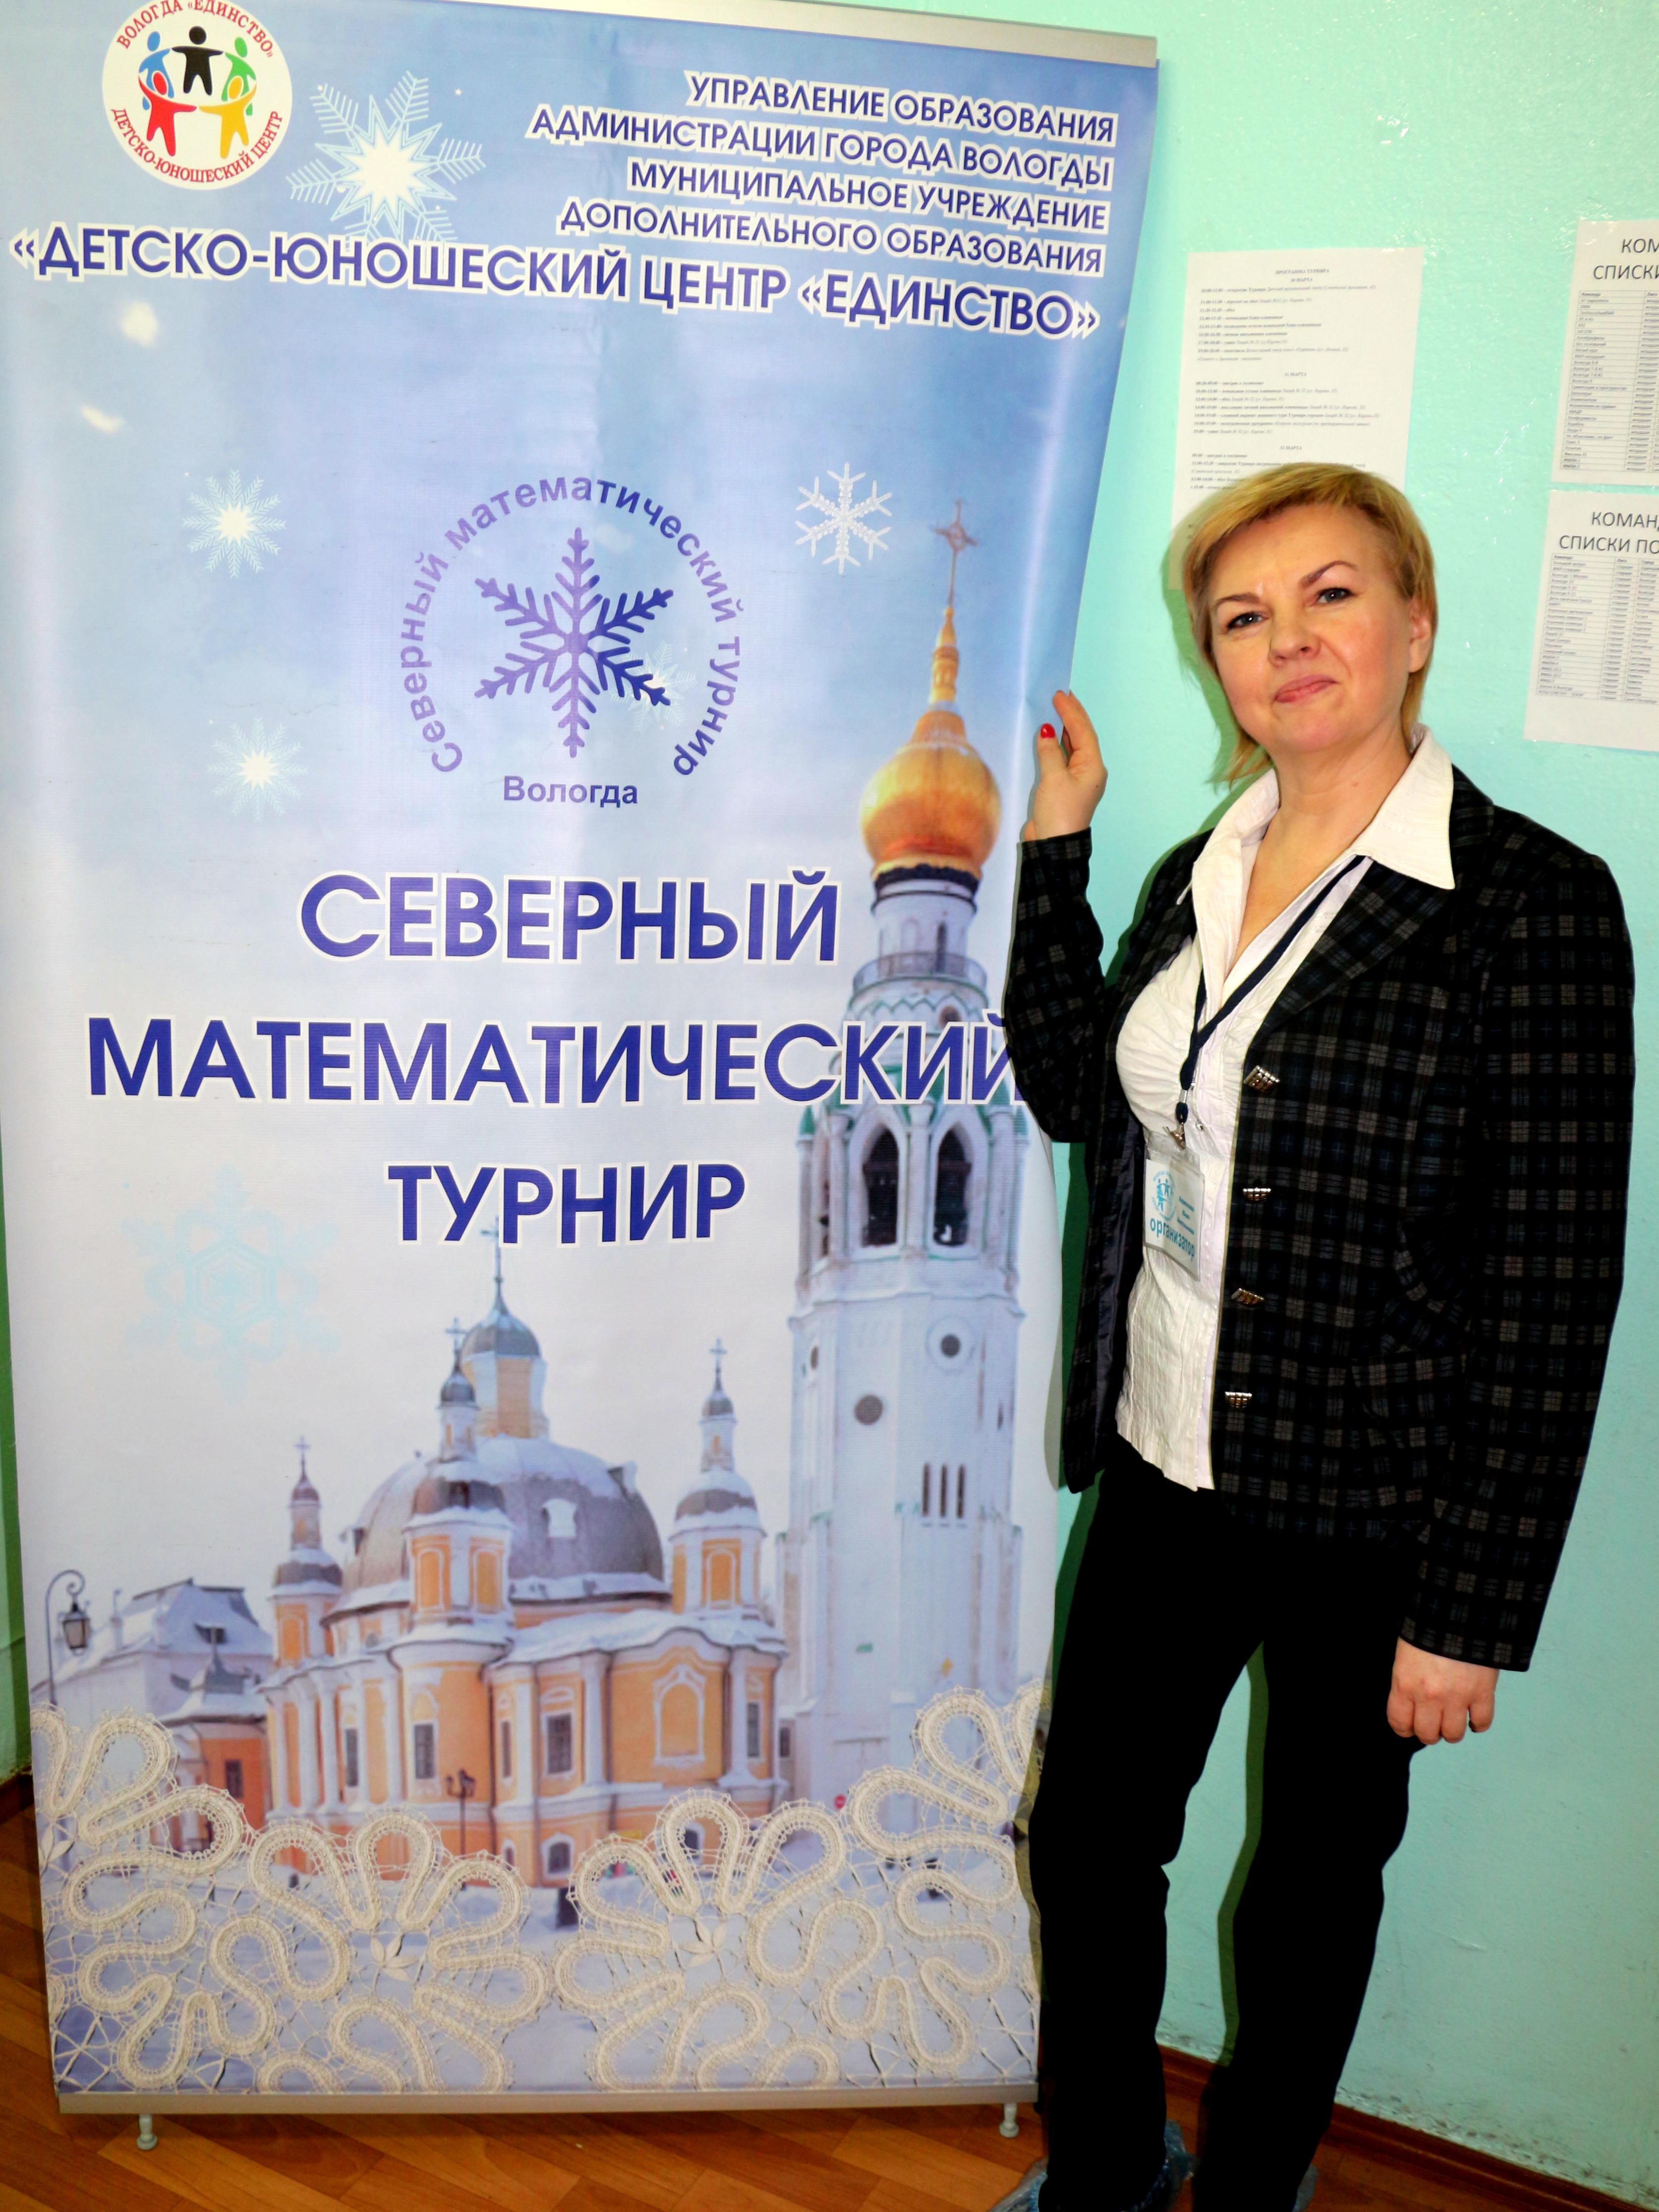 http://edinstvo.edu.ru/wp-content/uploads/IMG_6915_1.jpg